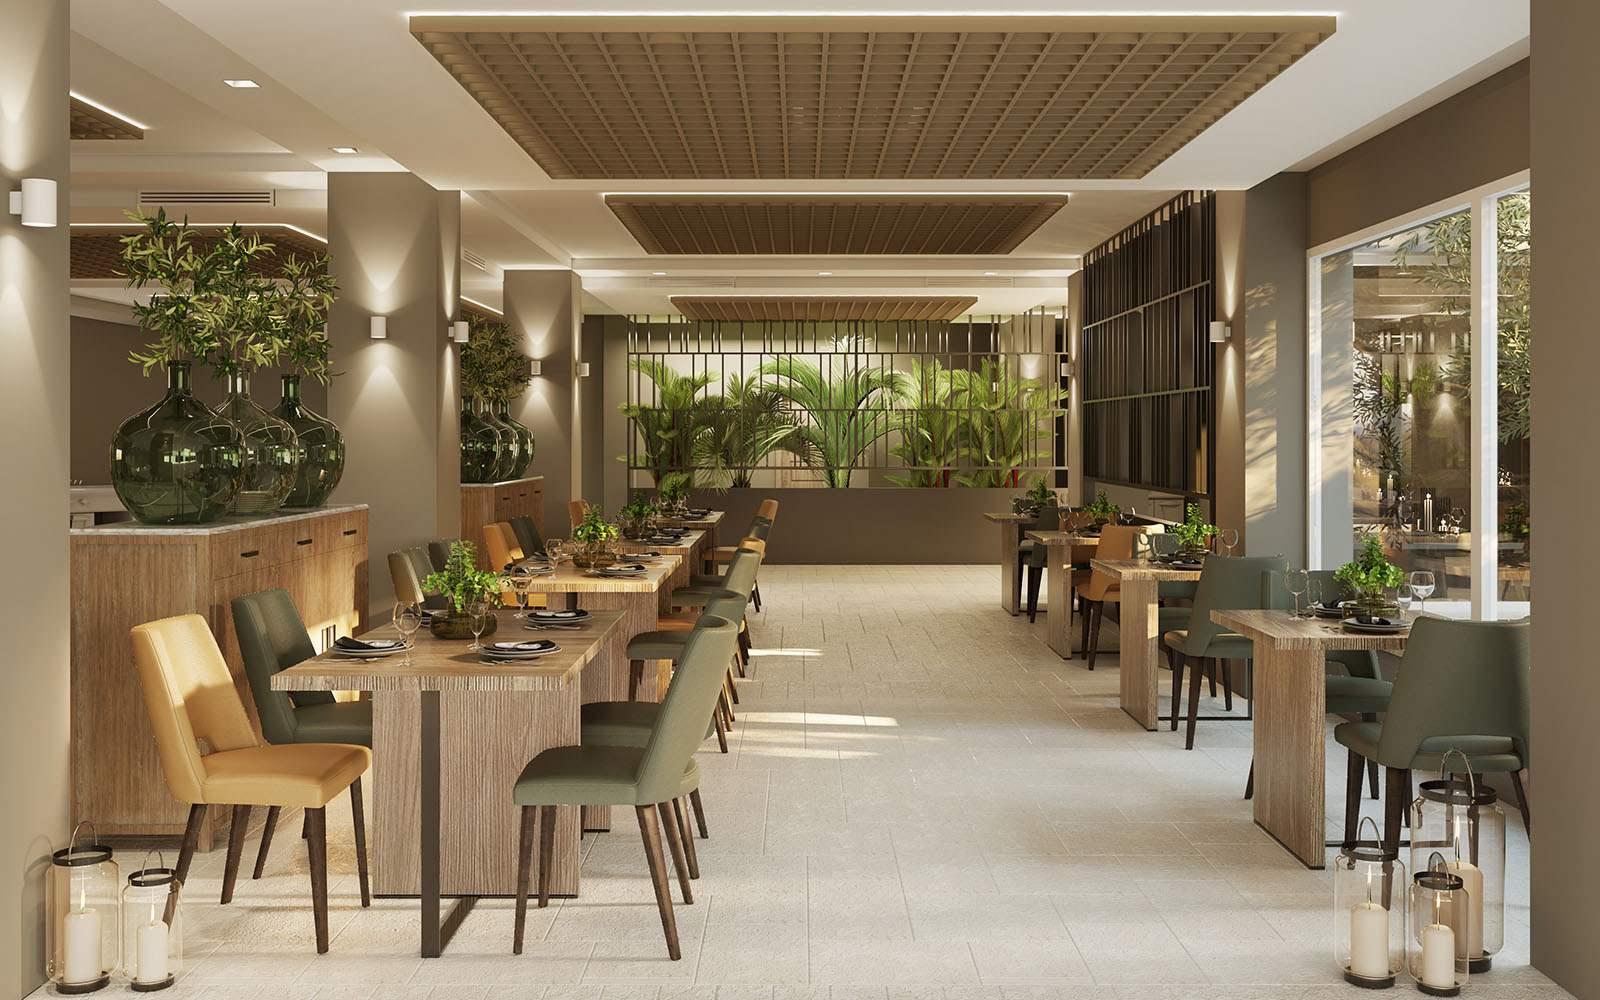 Hotel Laguna Sardinian Restaurant